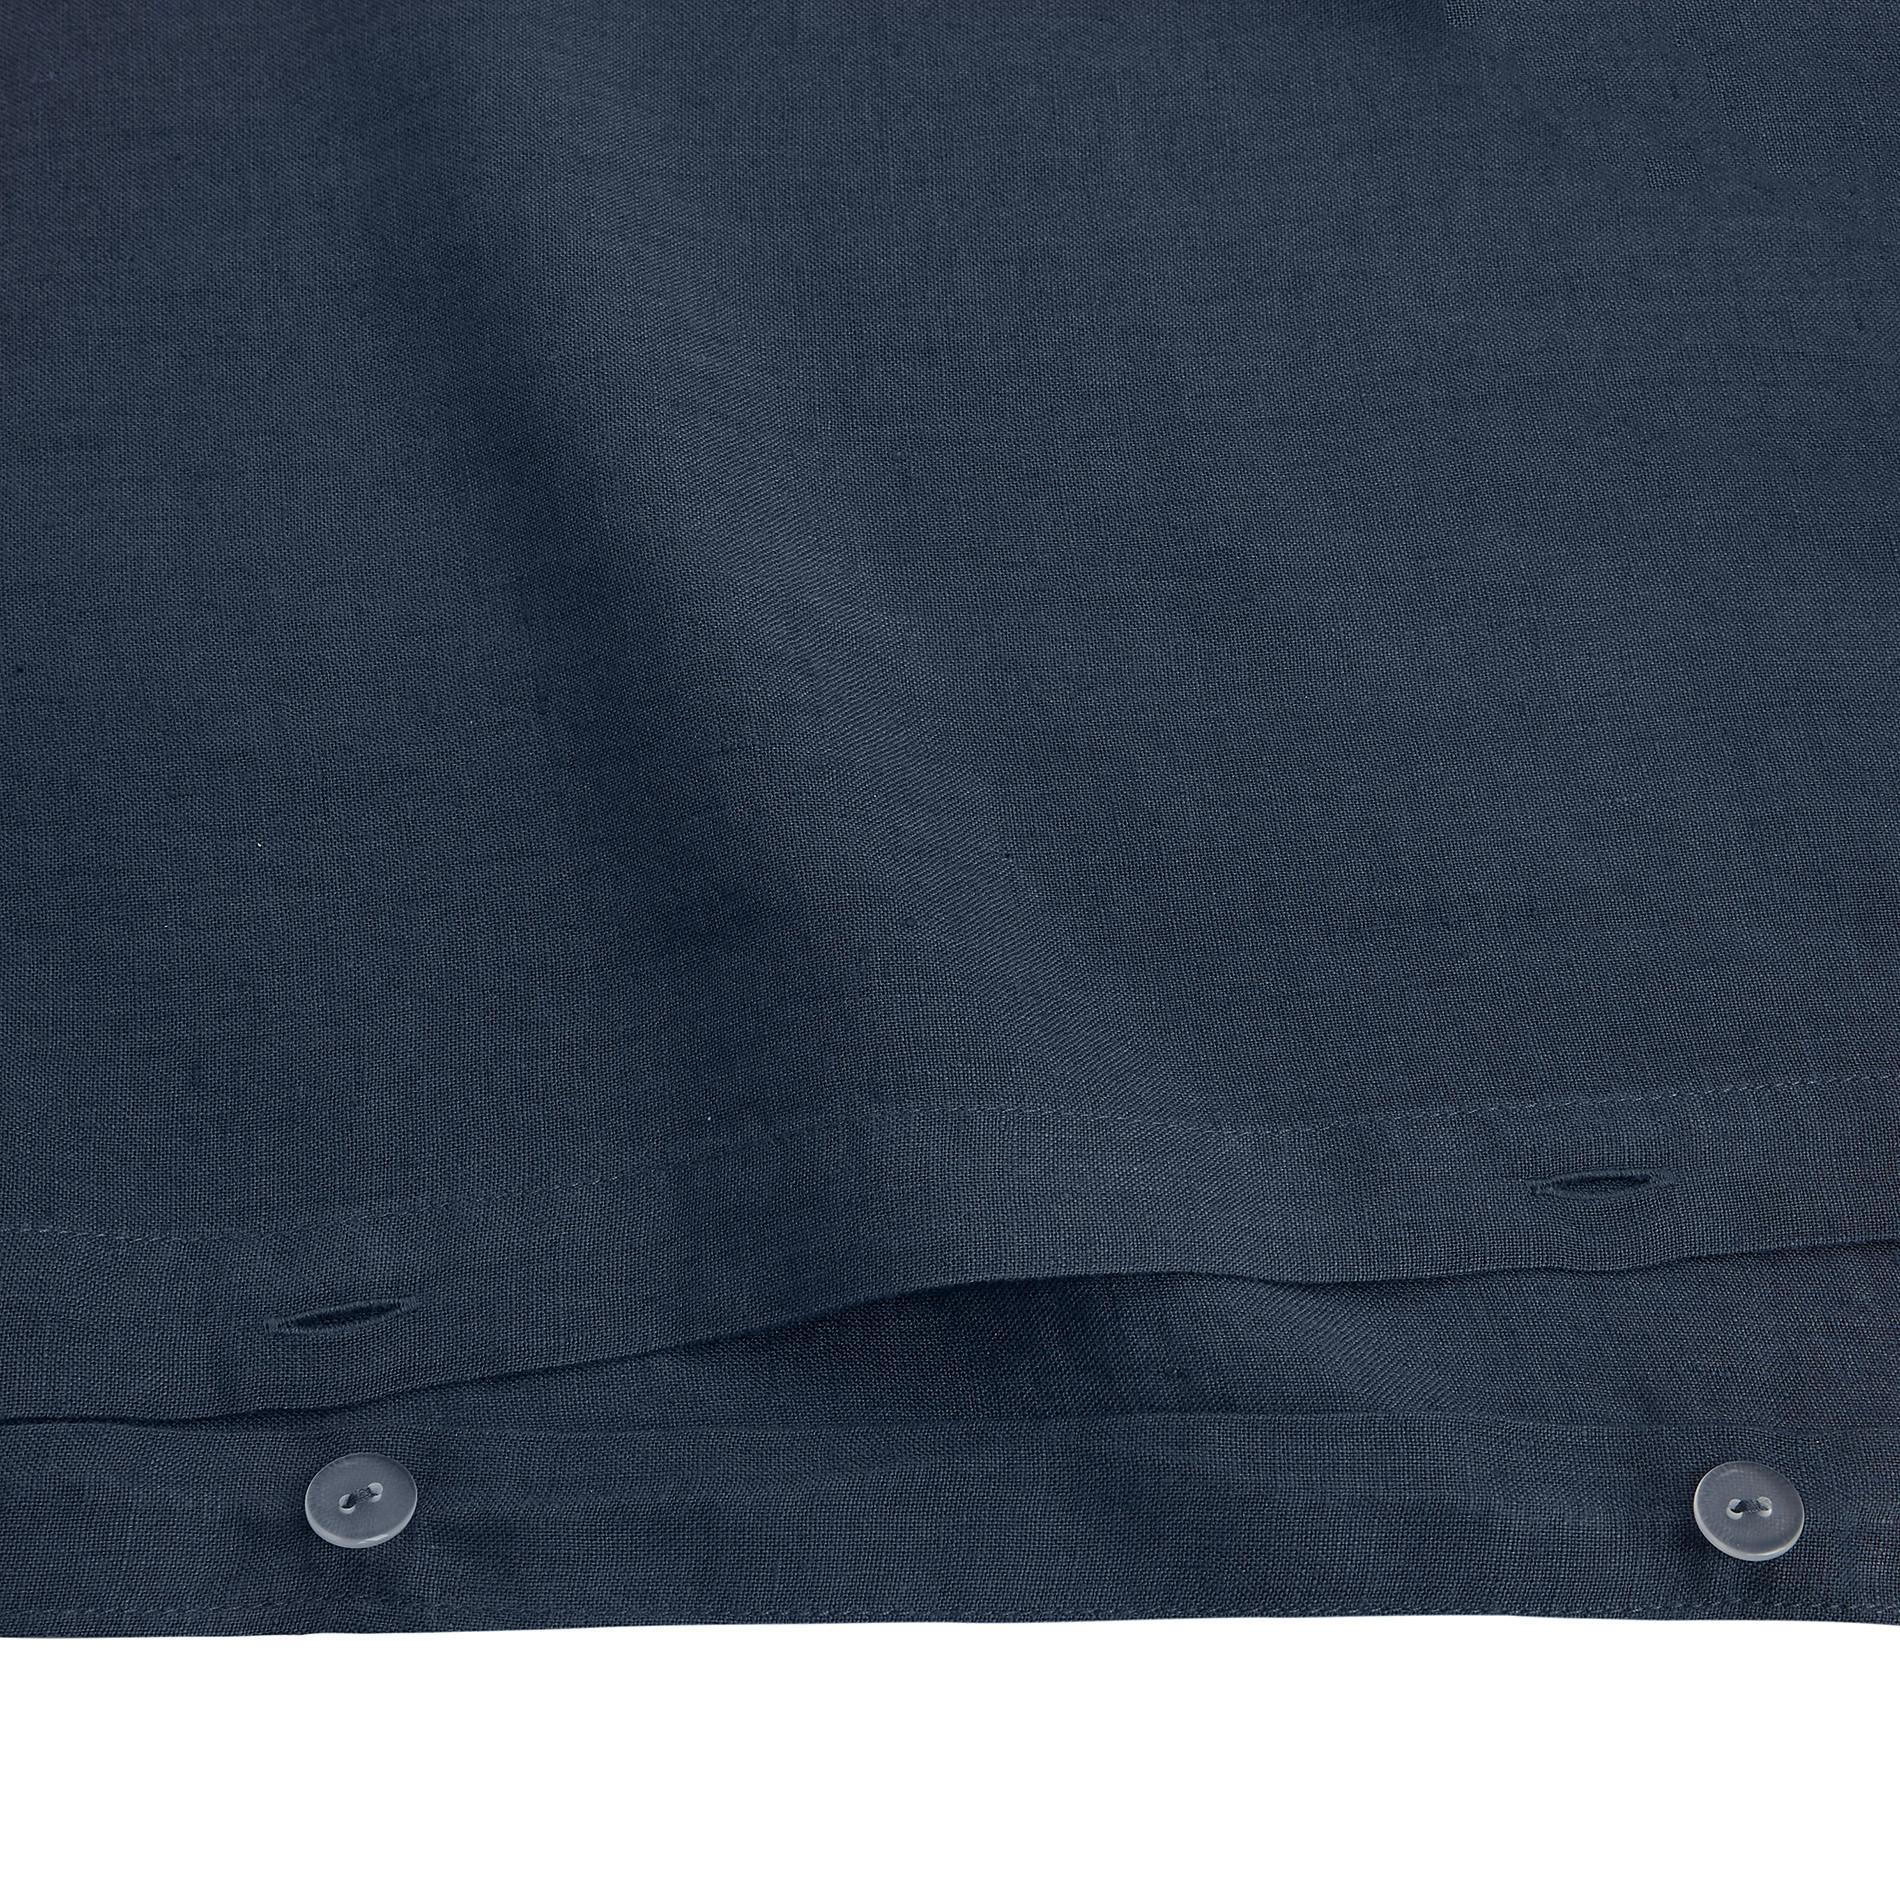 Copripiumino lino alta qualità Interno 11, Blu, large image number 3